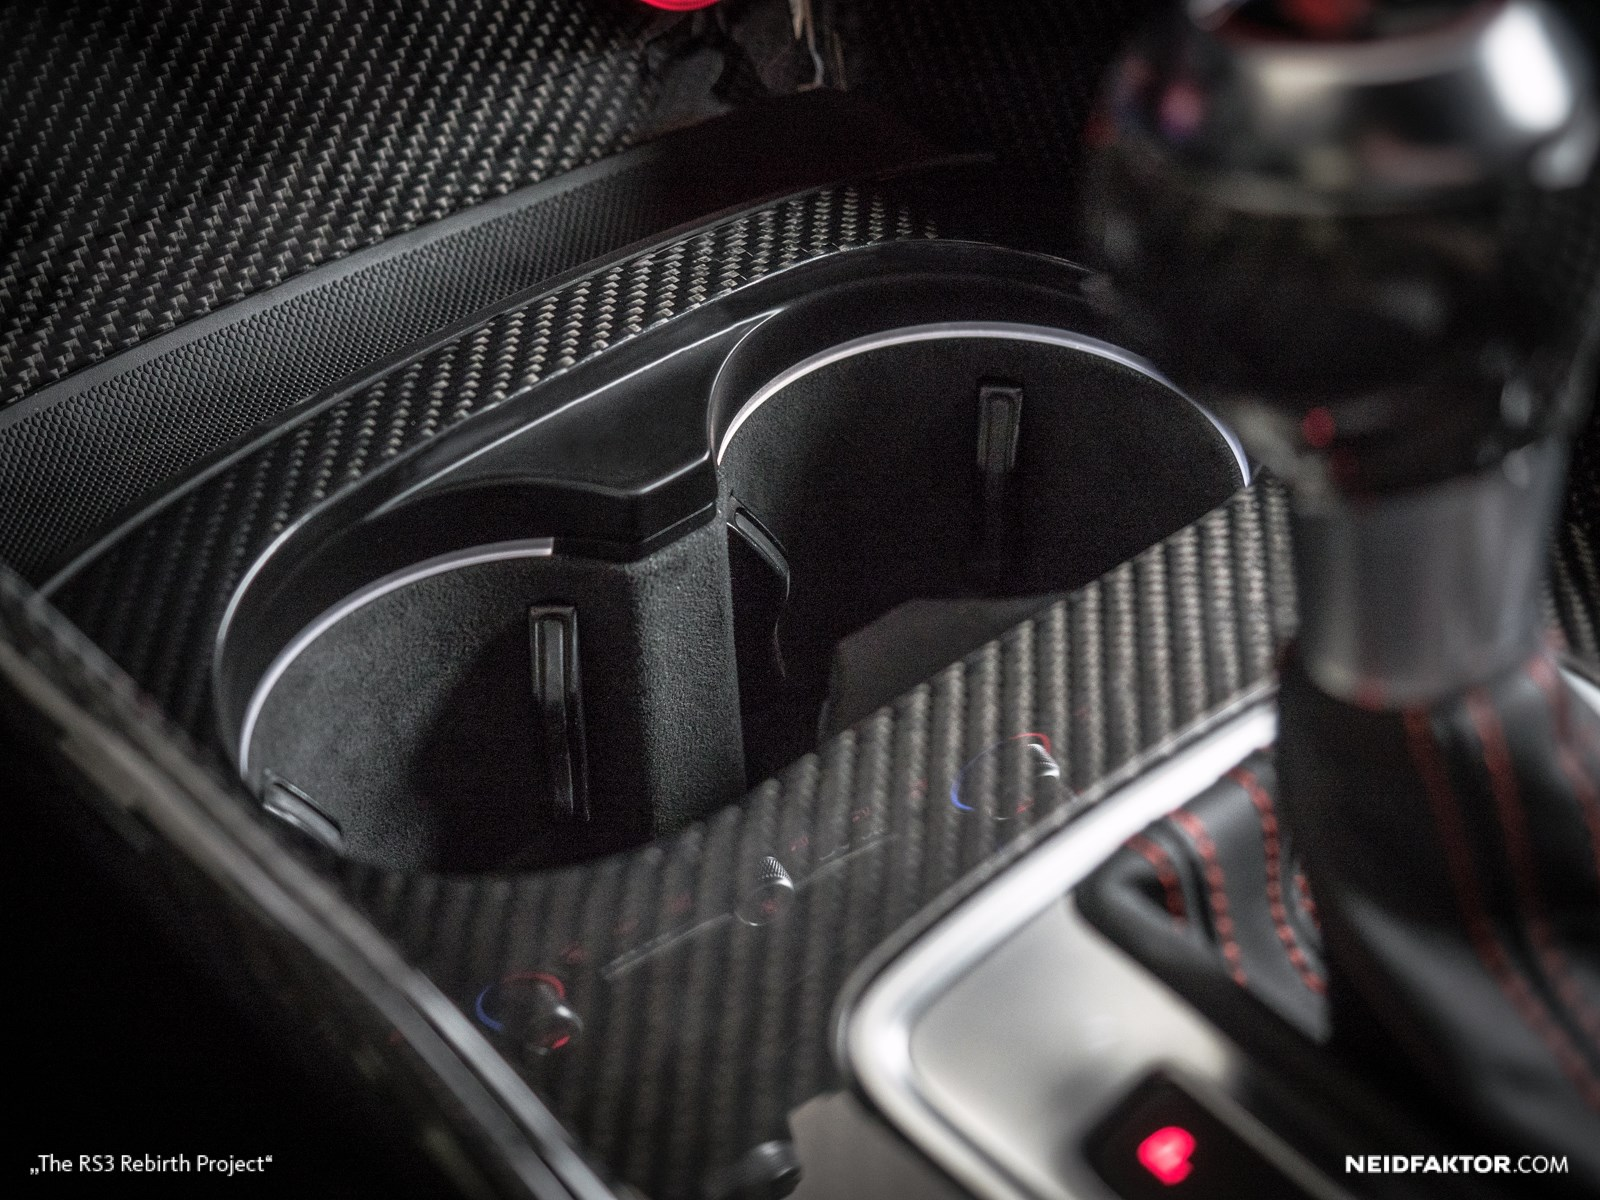 New Audi Rs3 Gets Carbon Fiber And Alcantara Interior From Neidfaktor Autoevolution